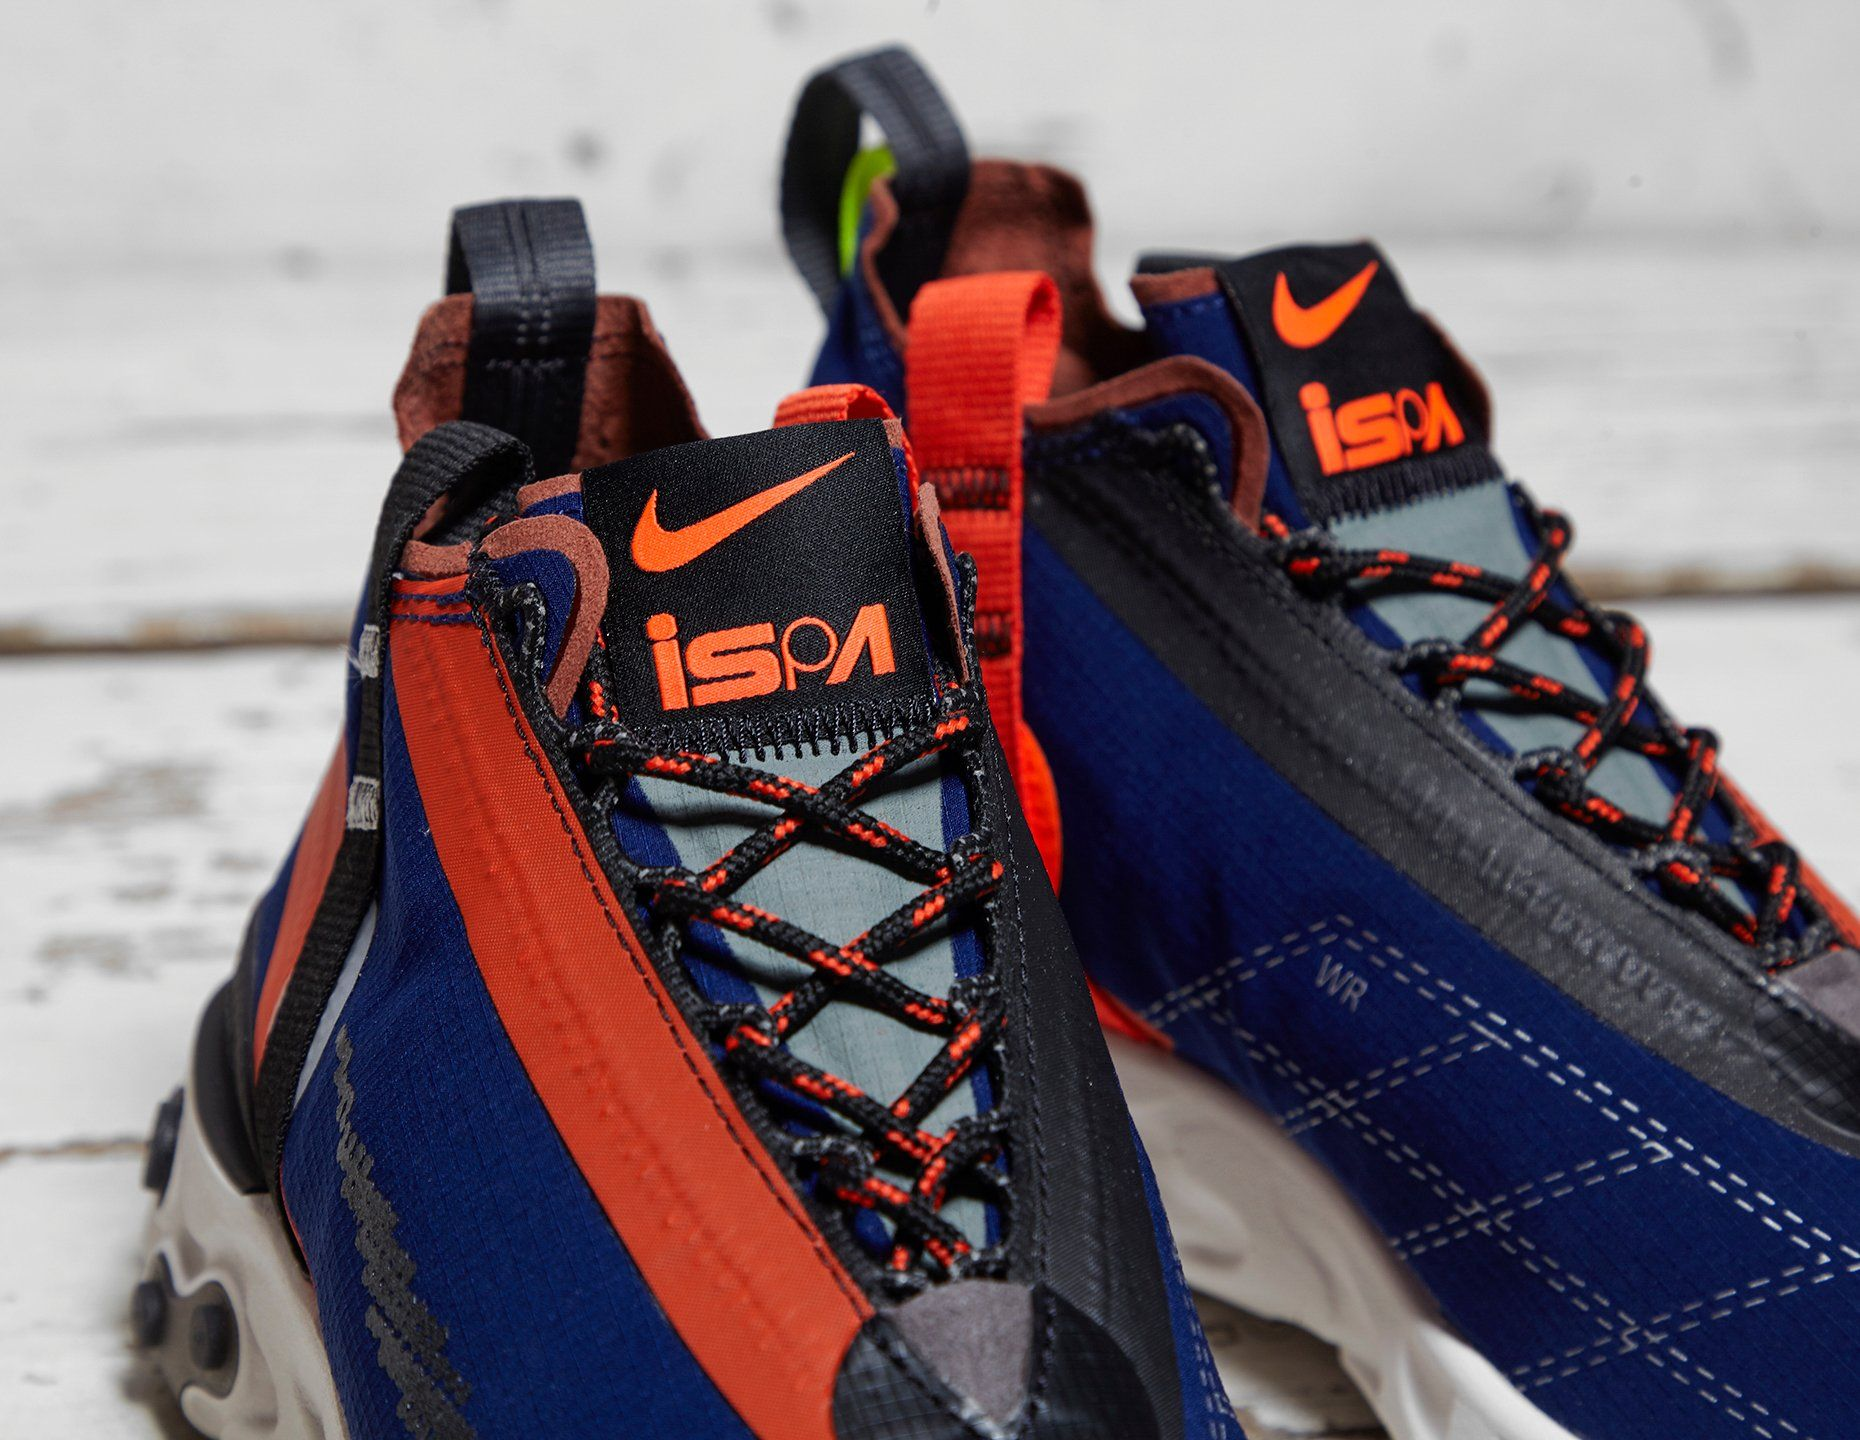 Nike REACT LW WR Mid ISPA